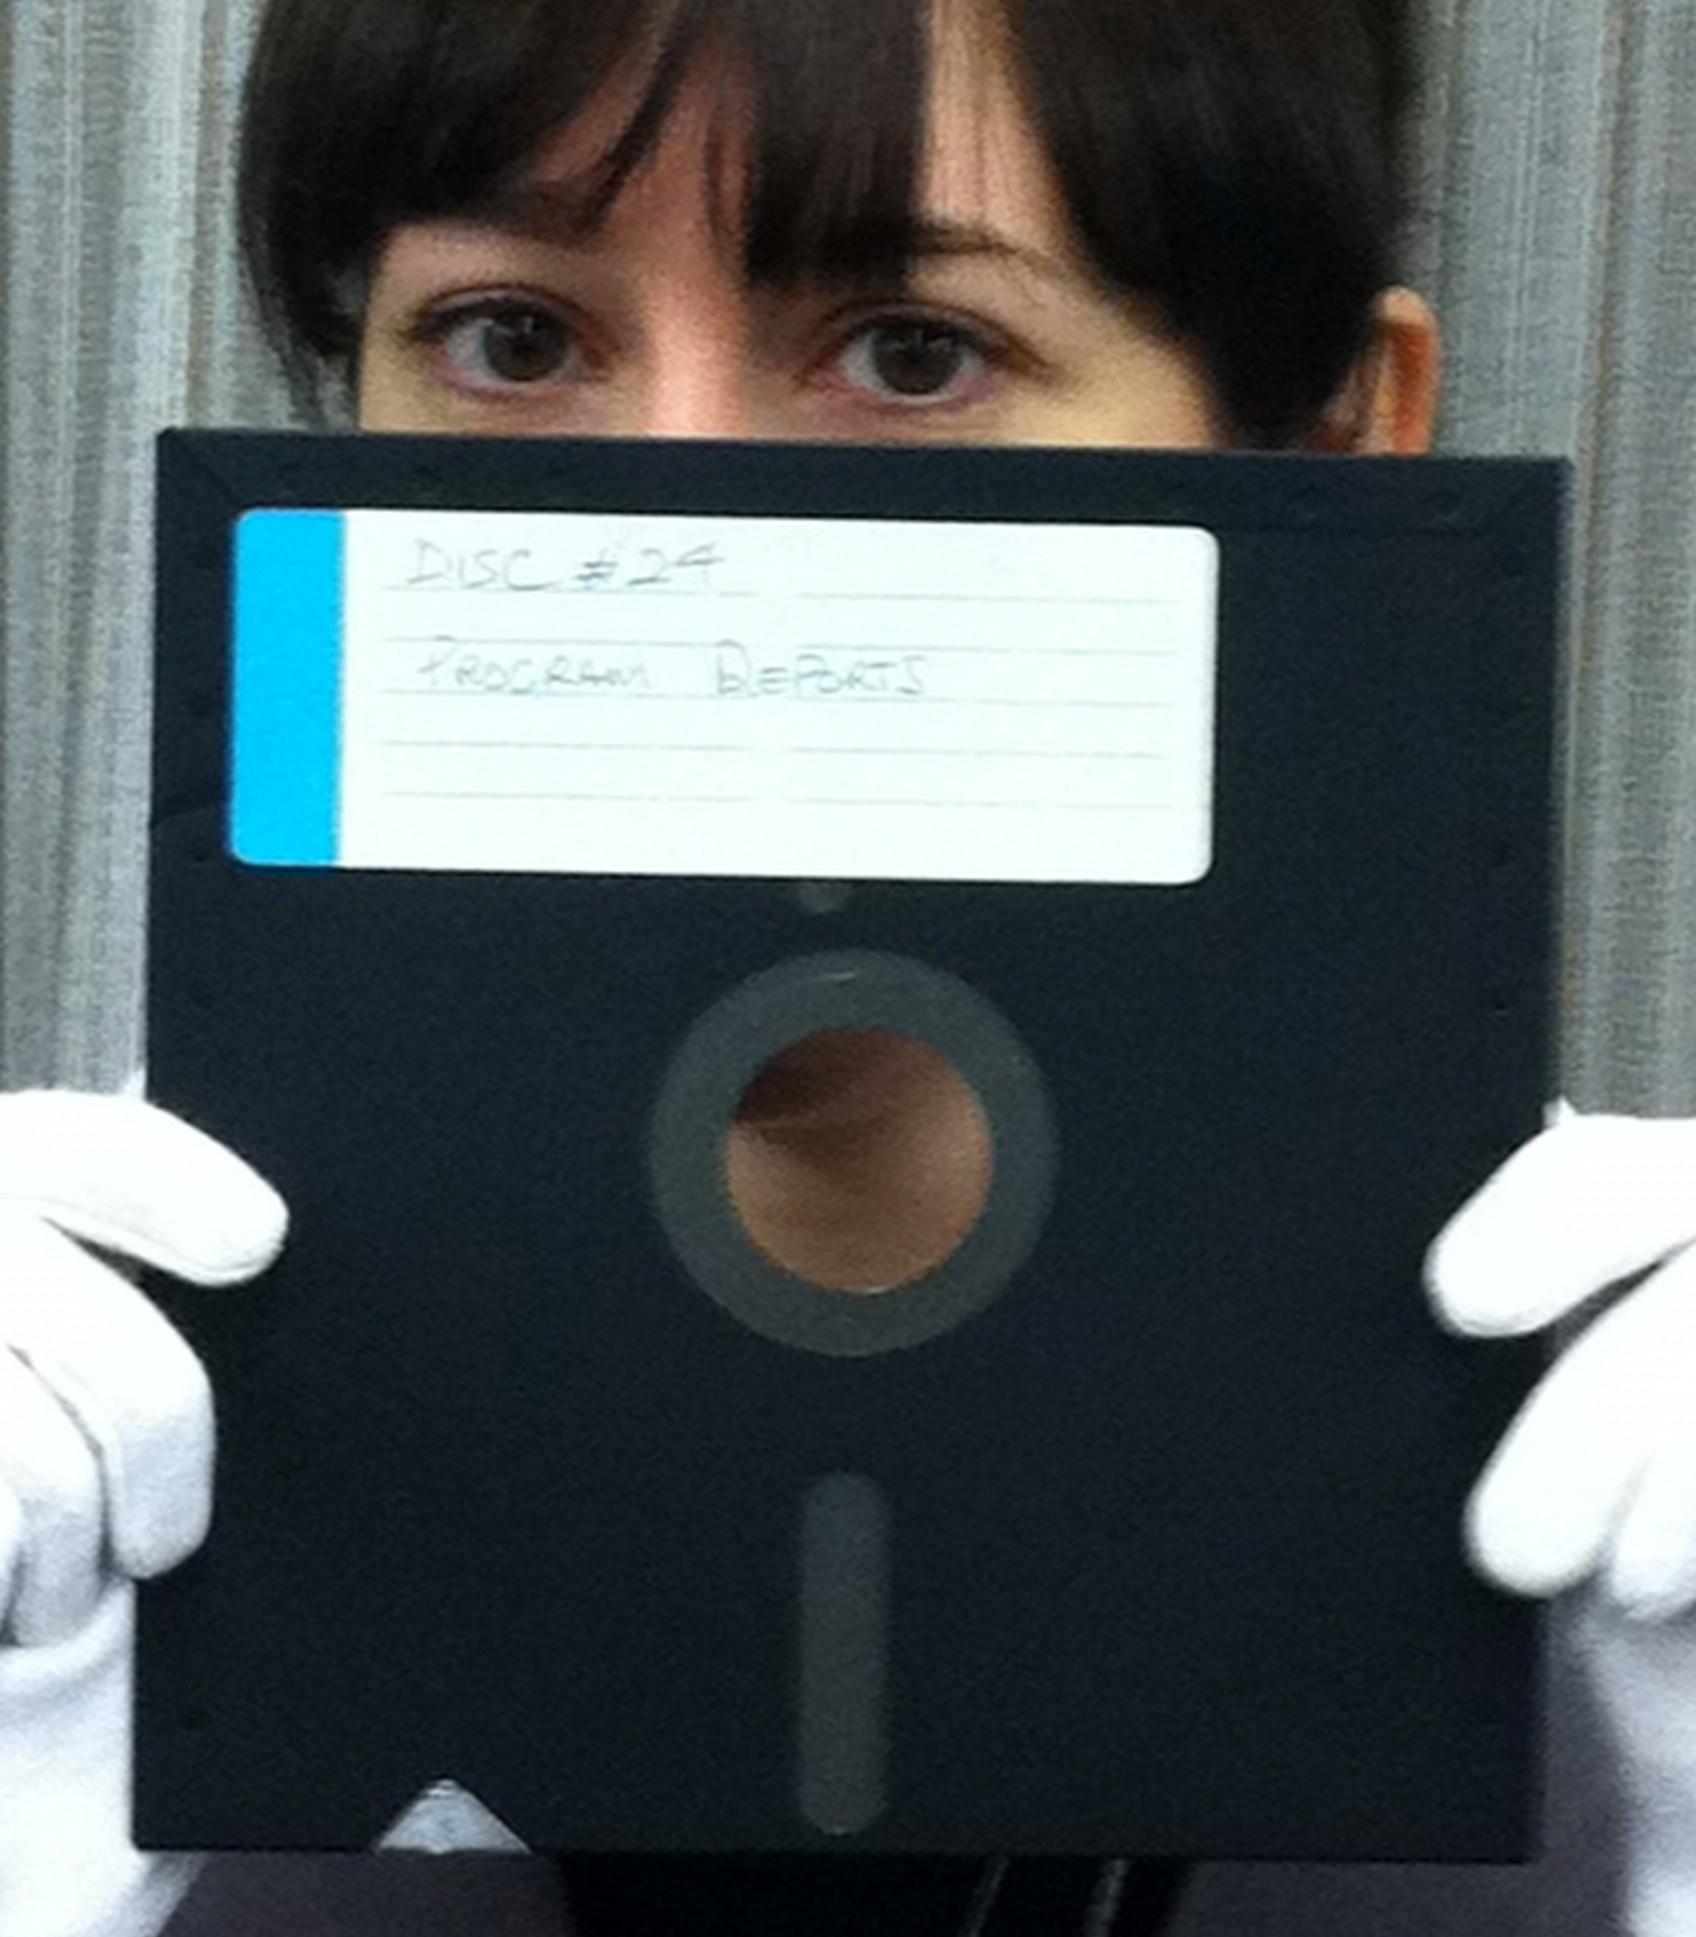 Archivist holding an 8-inch floppy disk